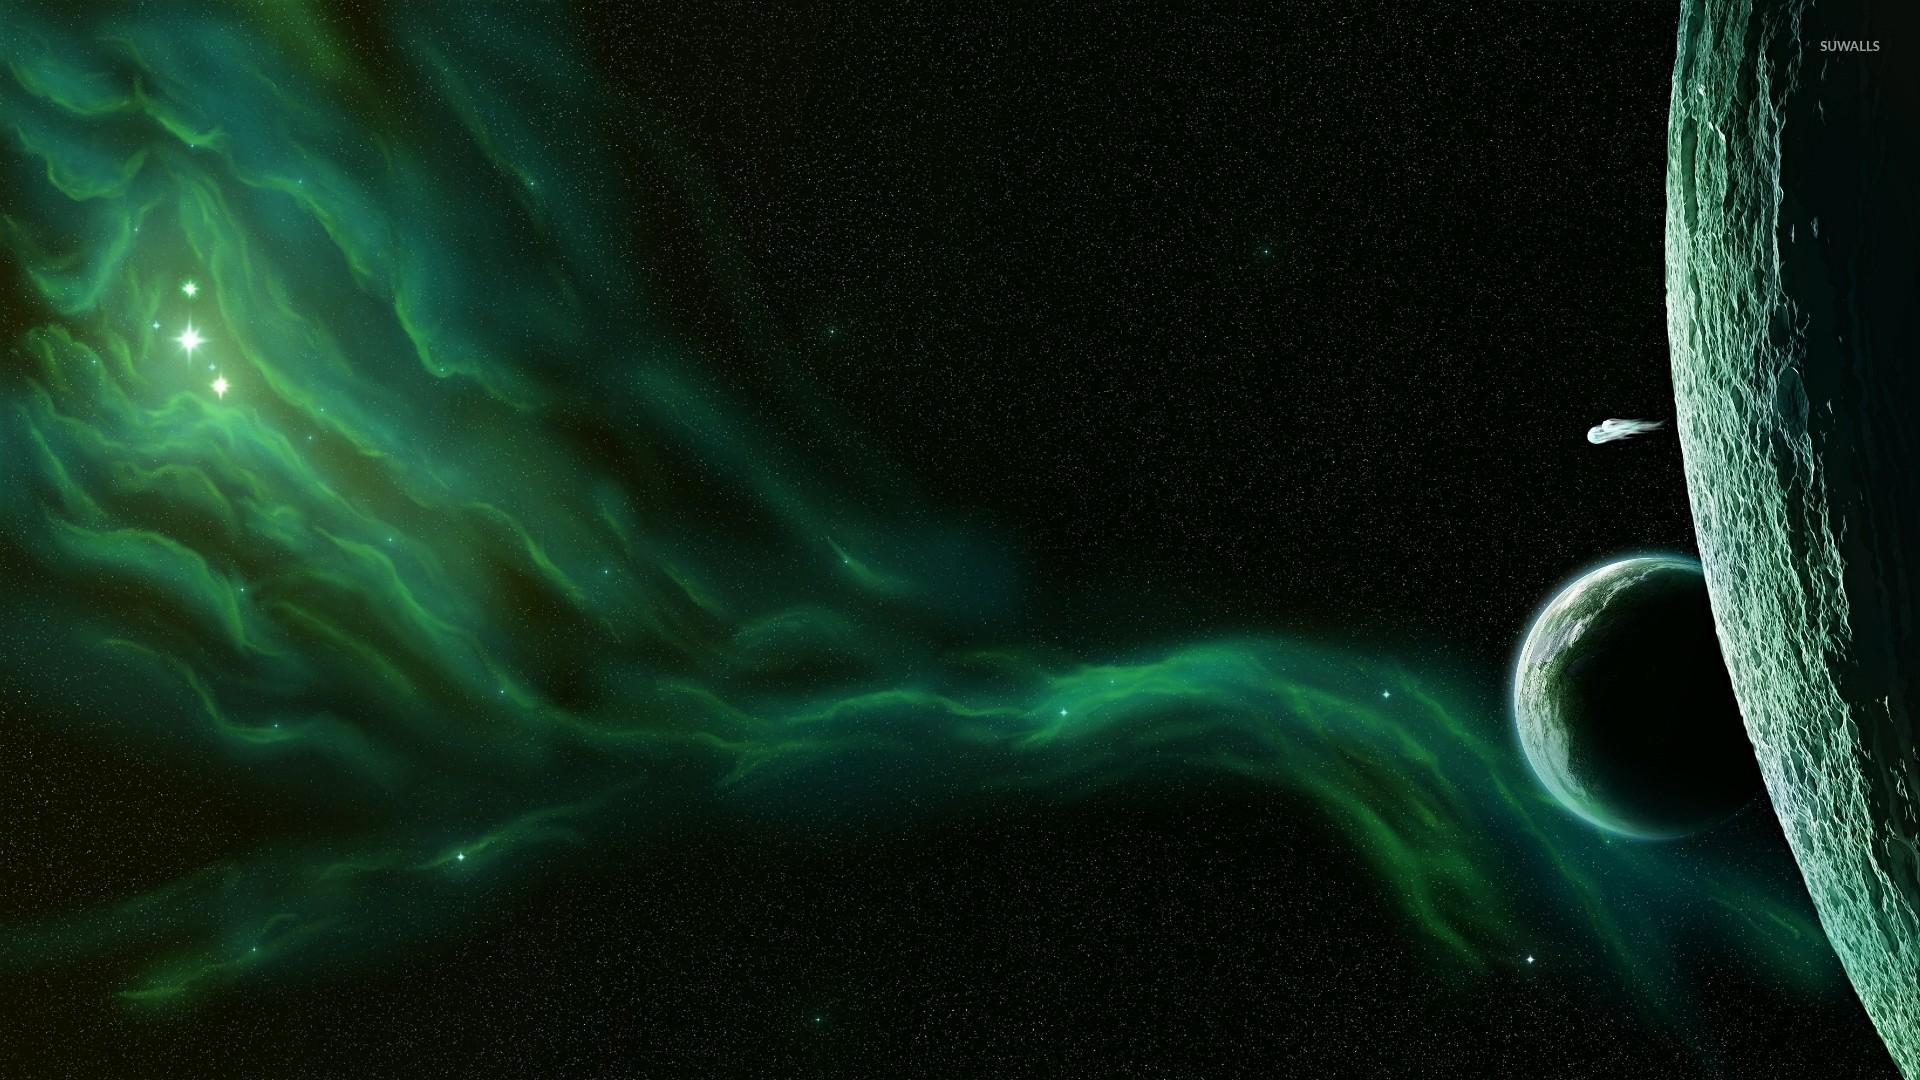 Green nebula [2] wallpaper